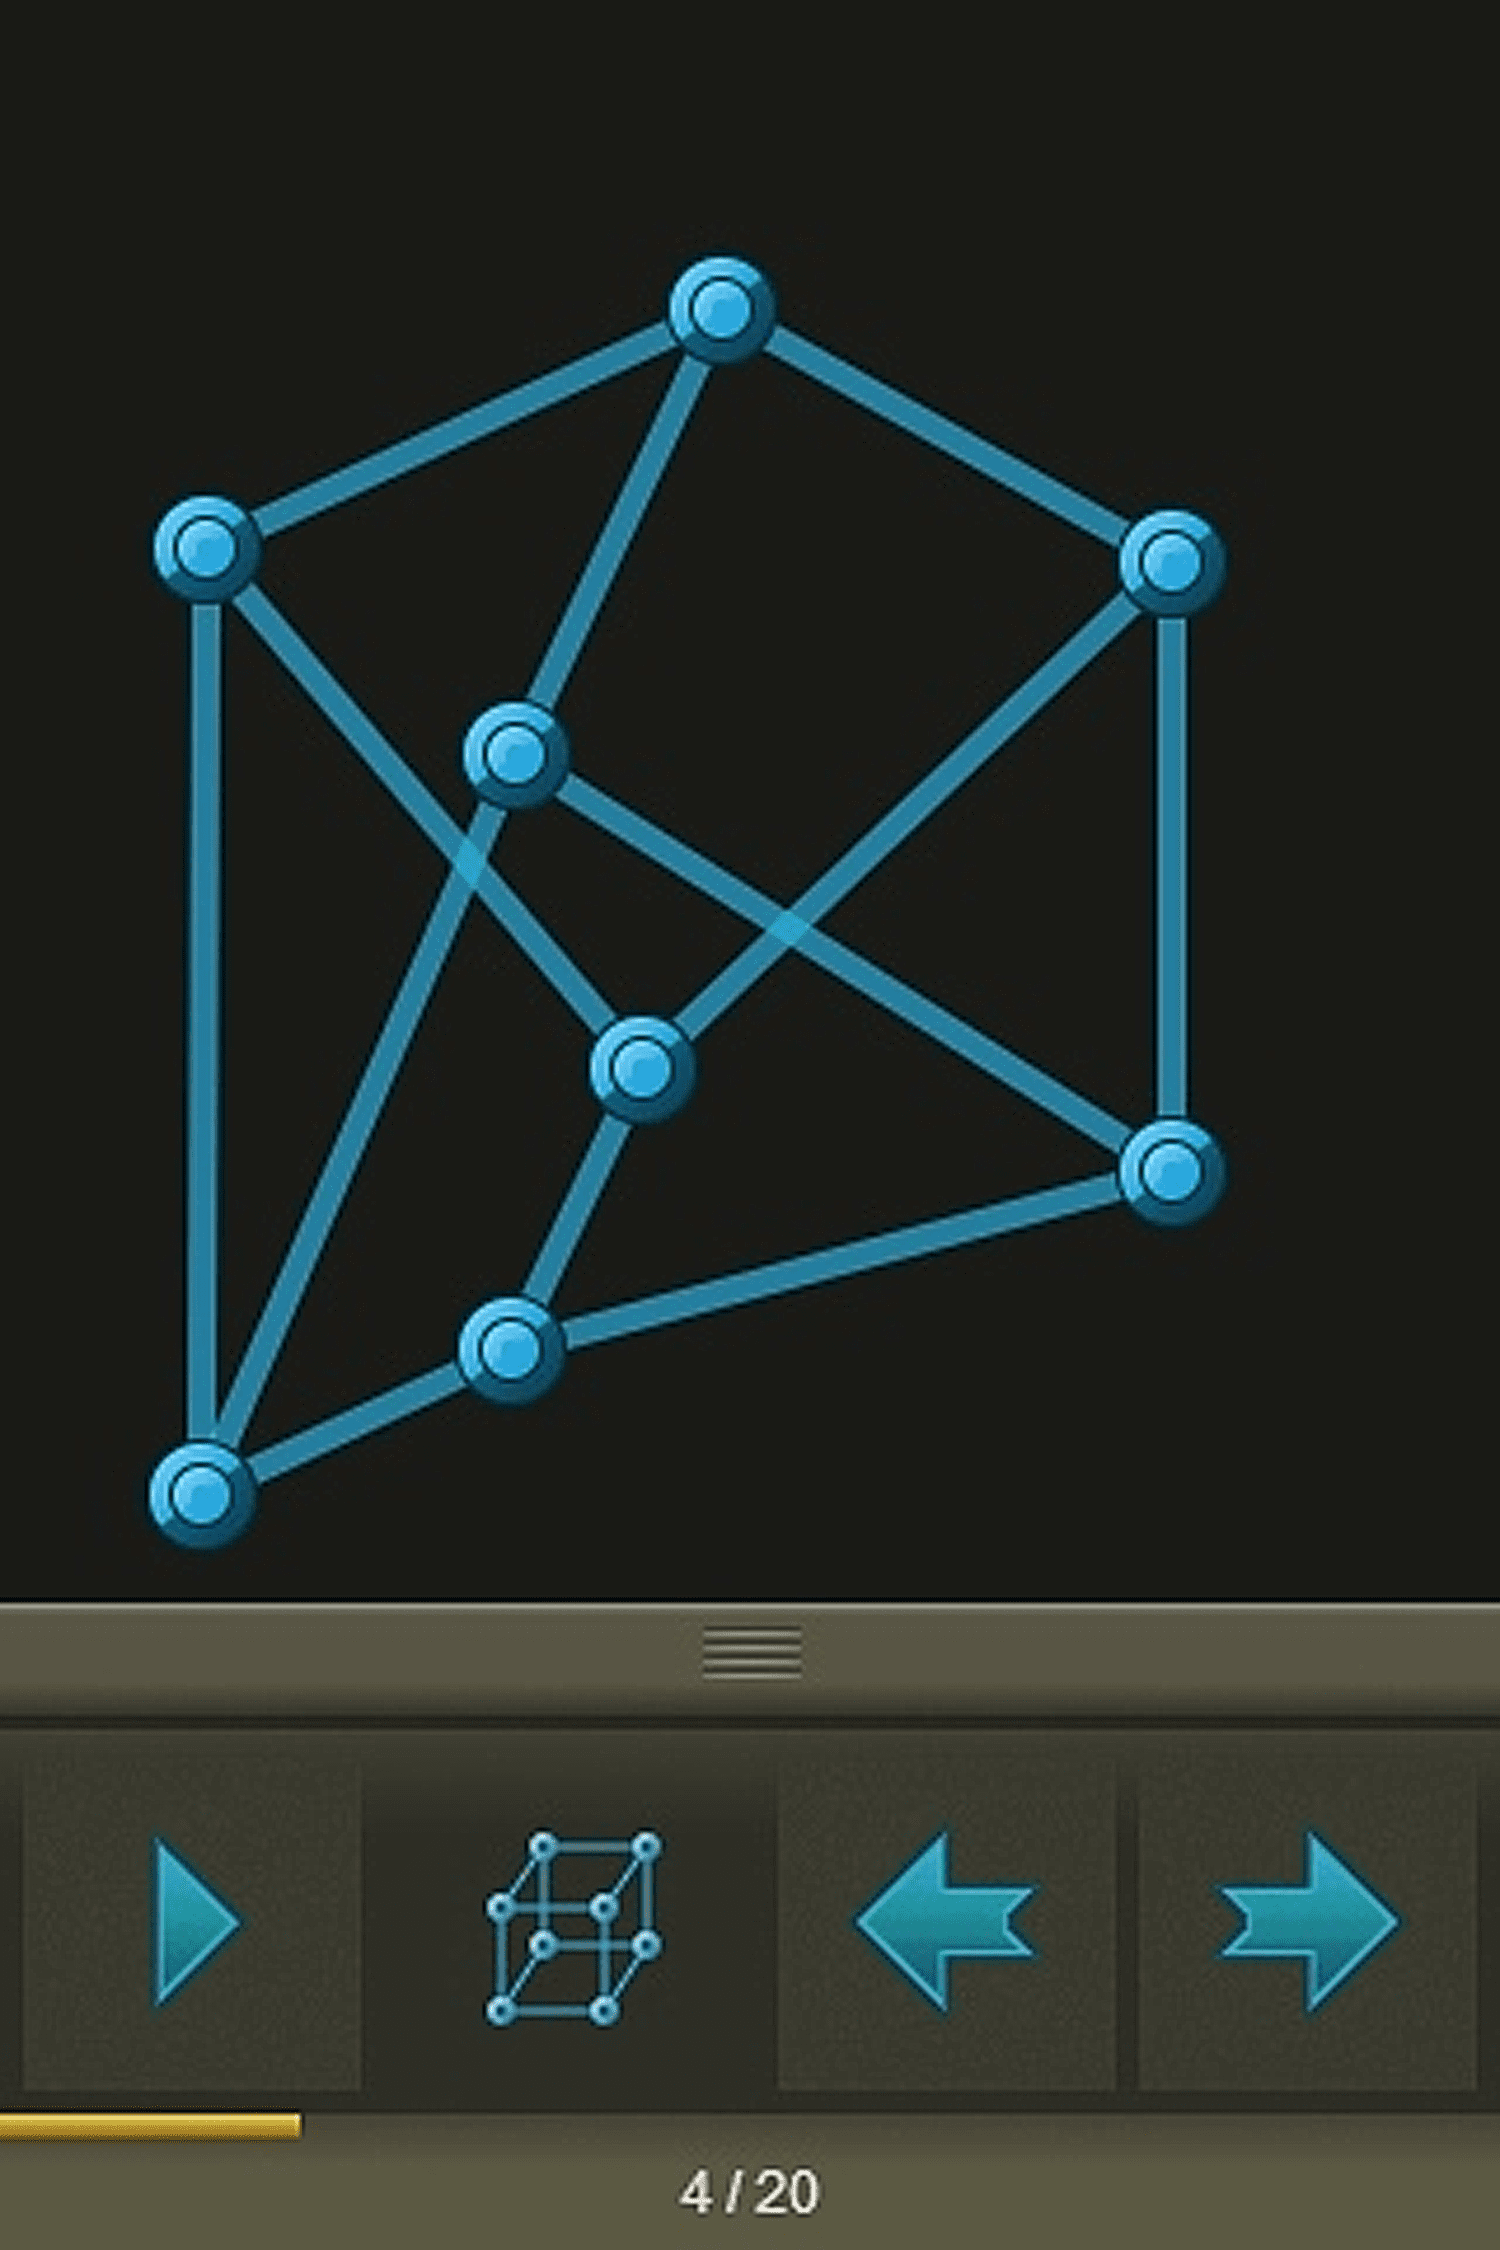 Tronix Puzzle Game